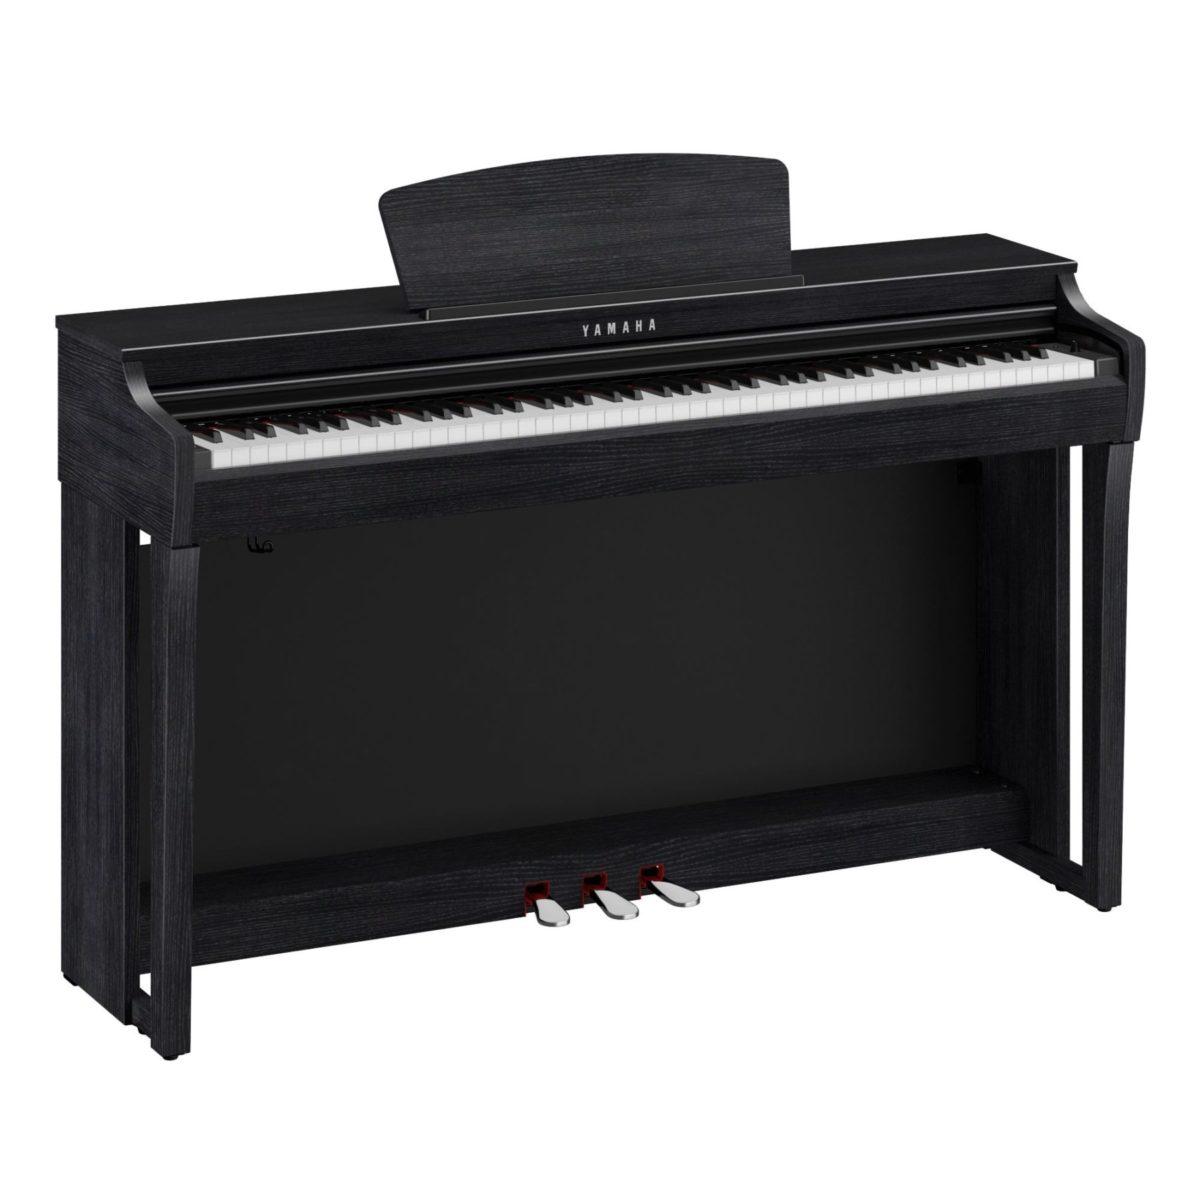 Yamaha CLP-725 B Digital Piano